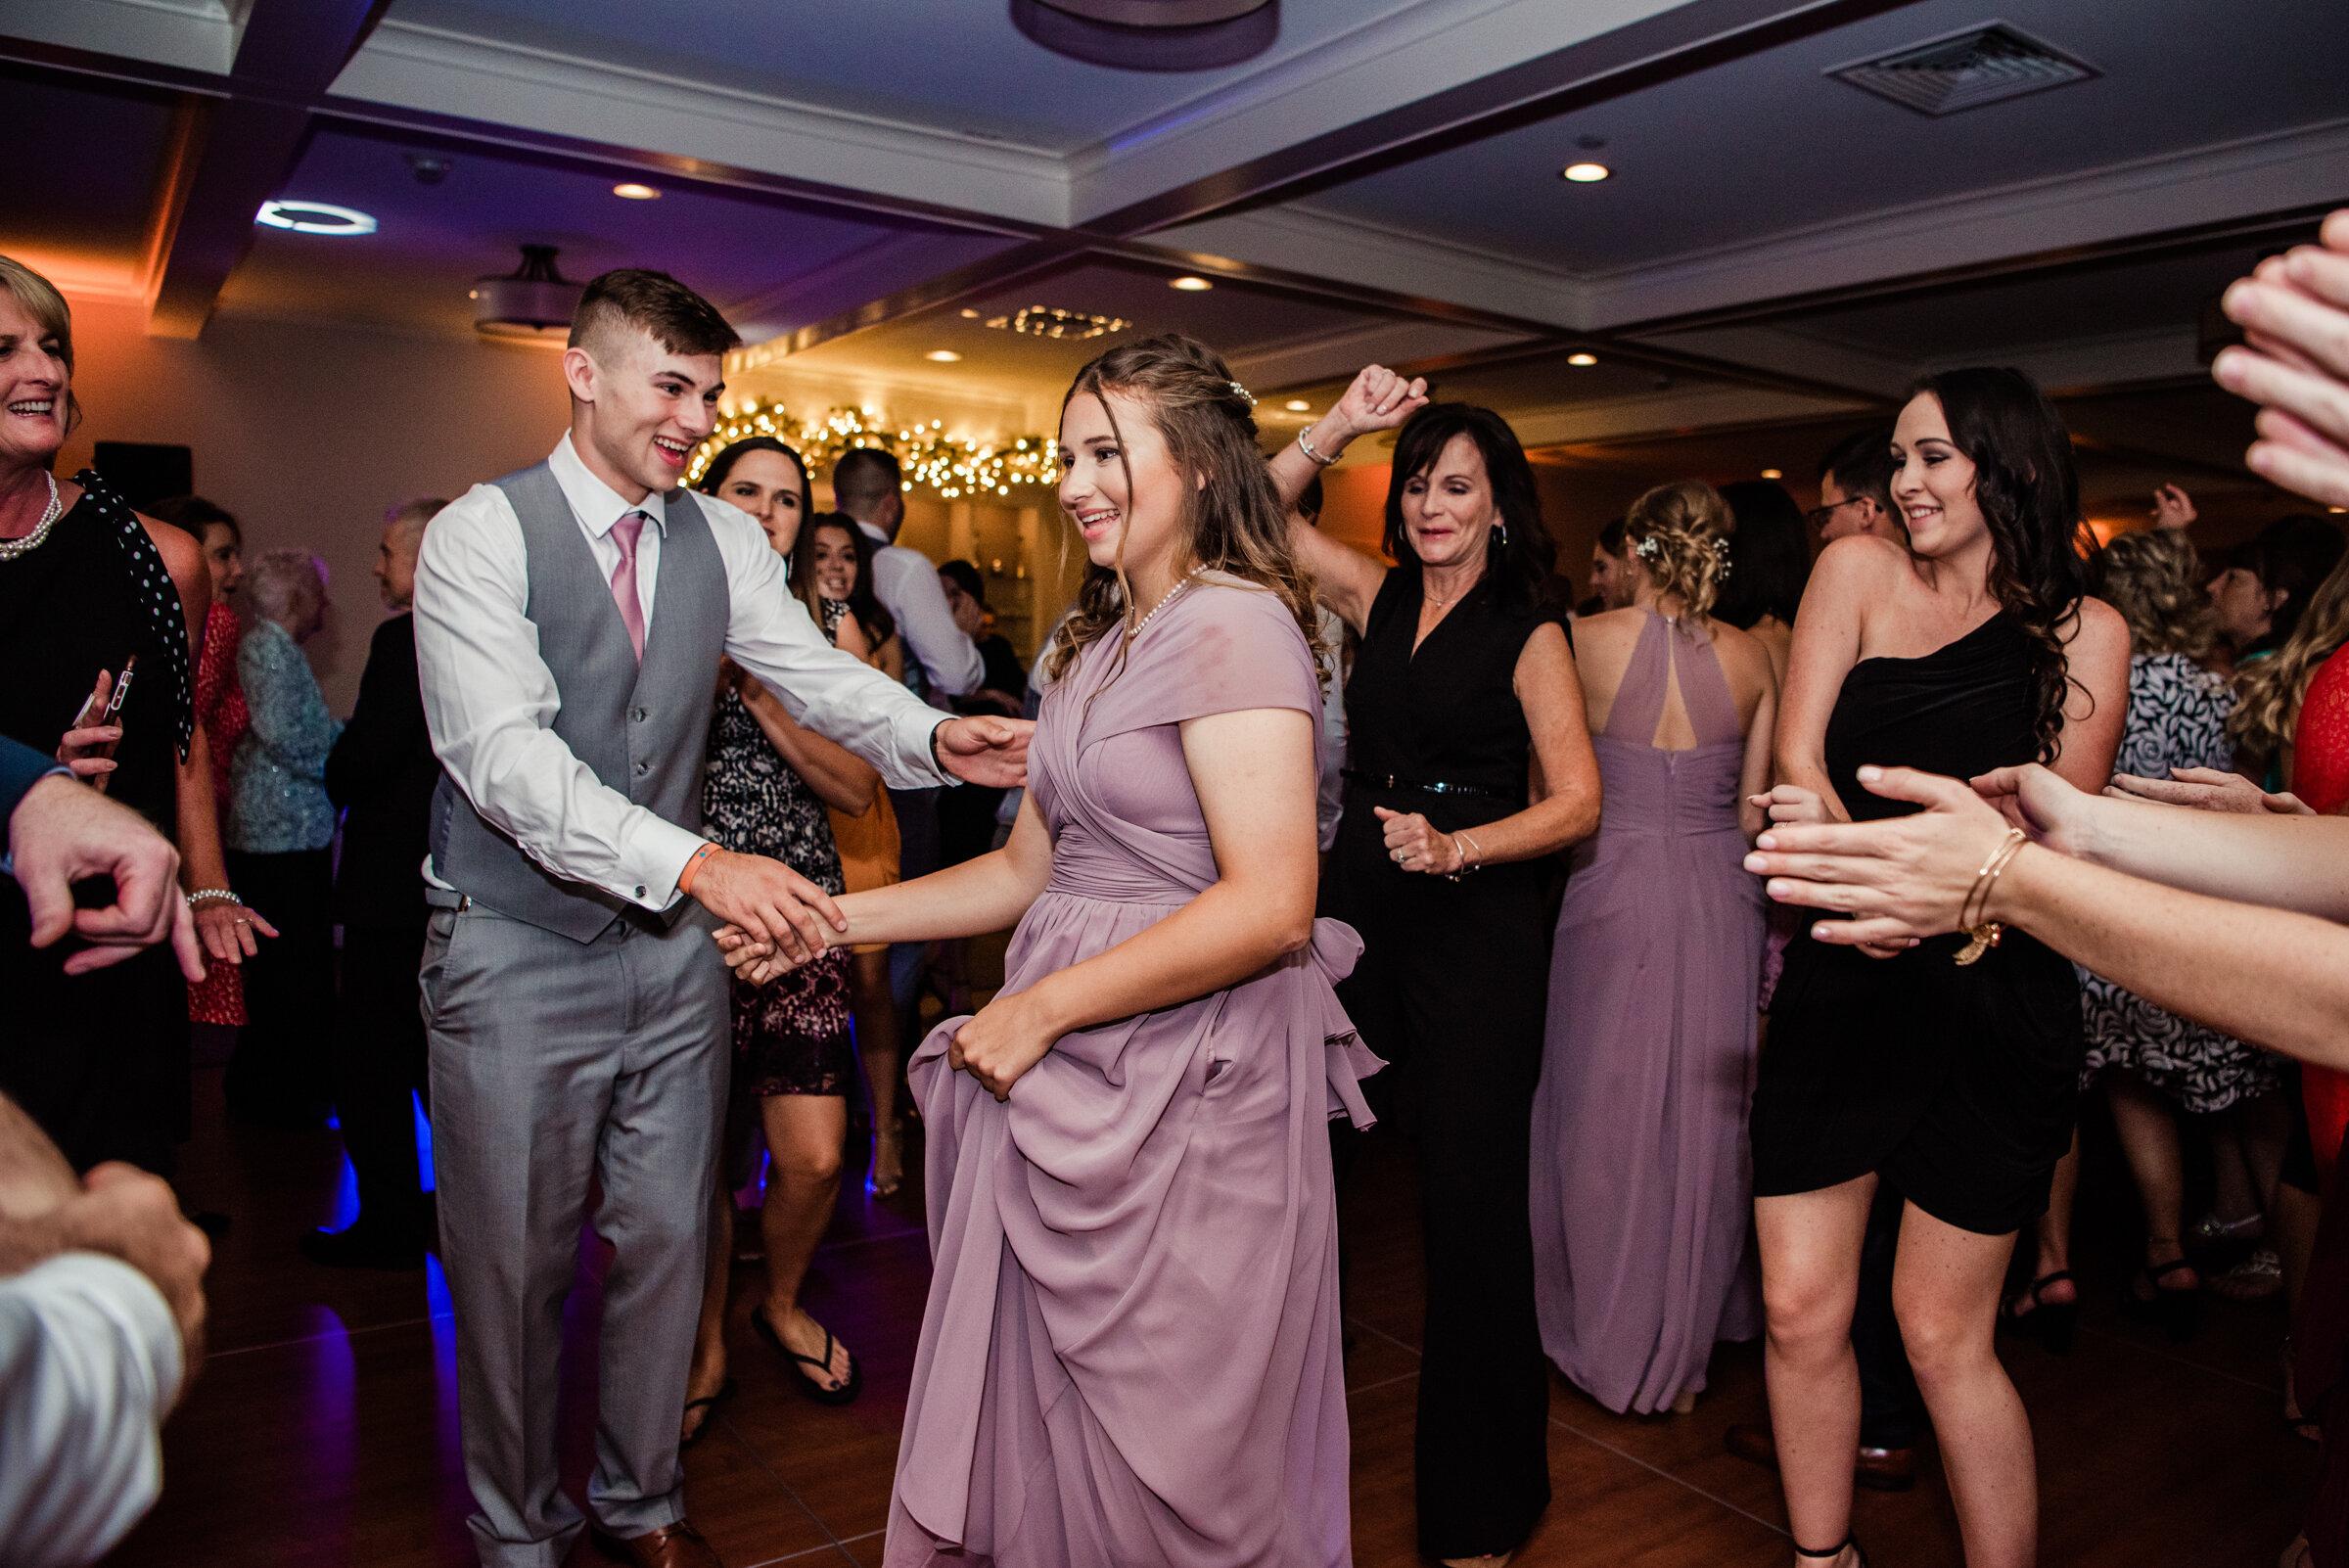 Deerfield_Country_Club_Rochester_Wedding_JILL_STUDIO_Rochester_NY_Photographer_DSC_7411.jpg